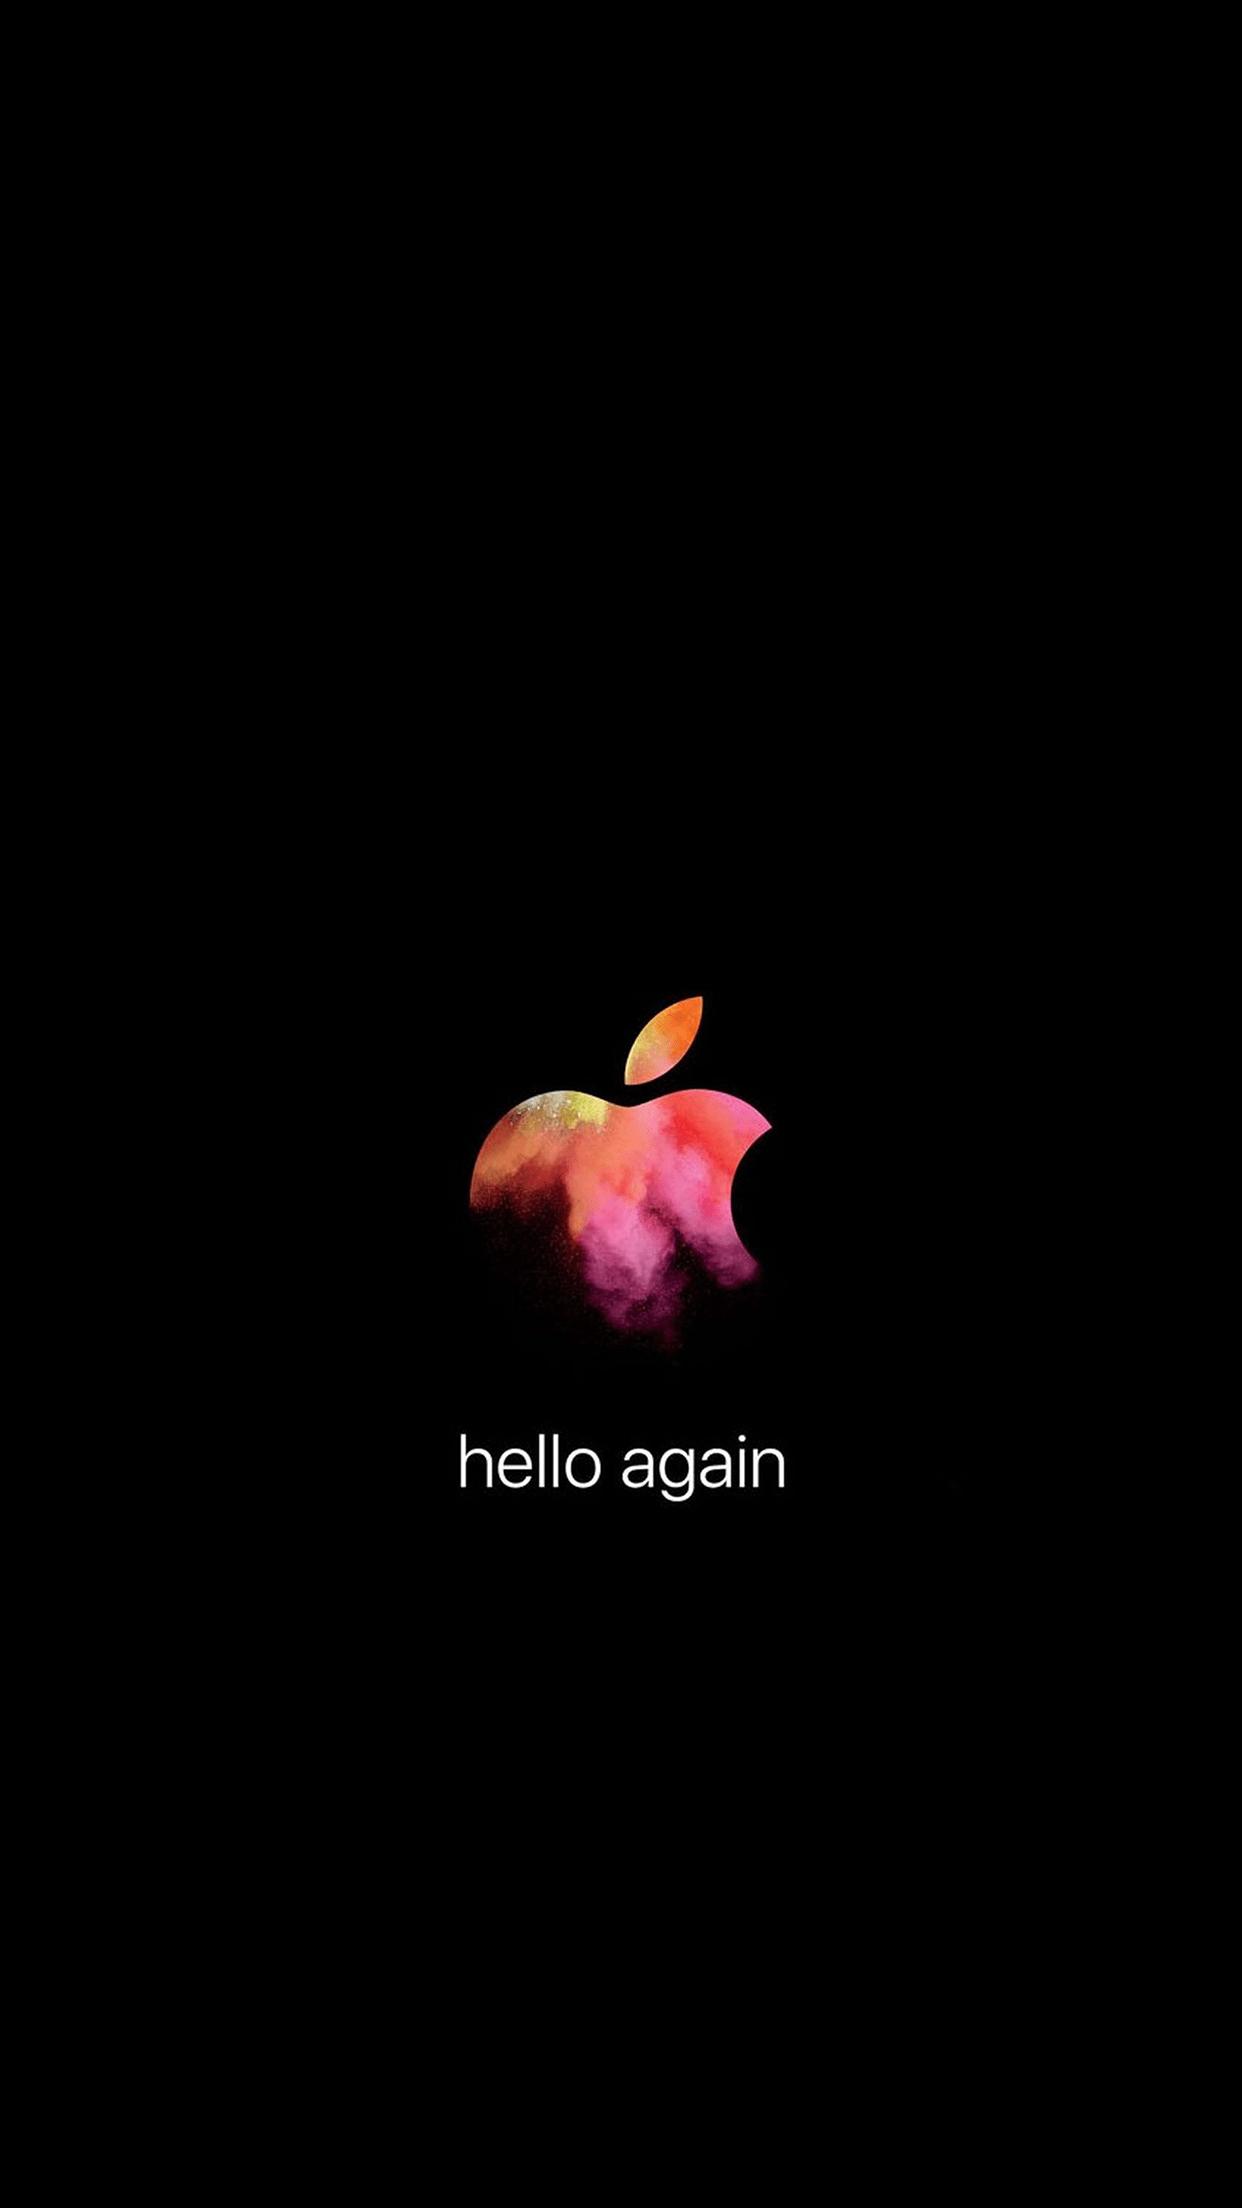 Iphone X Inside Wallpaper Hd Apple October 27 Event Wallpapers Quot Hello Again Quot